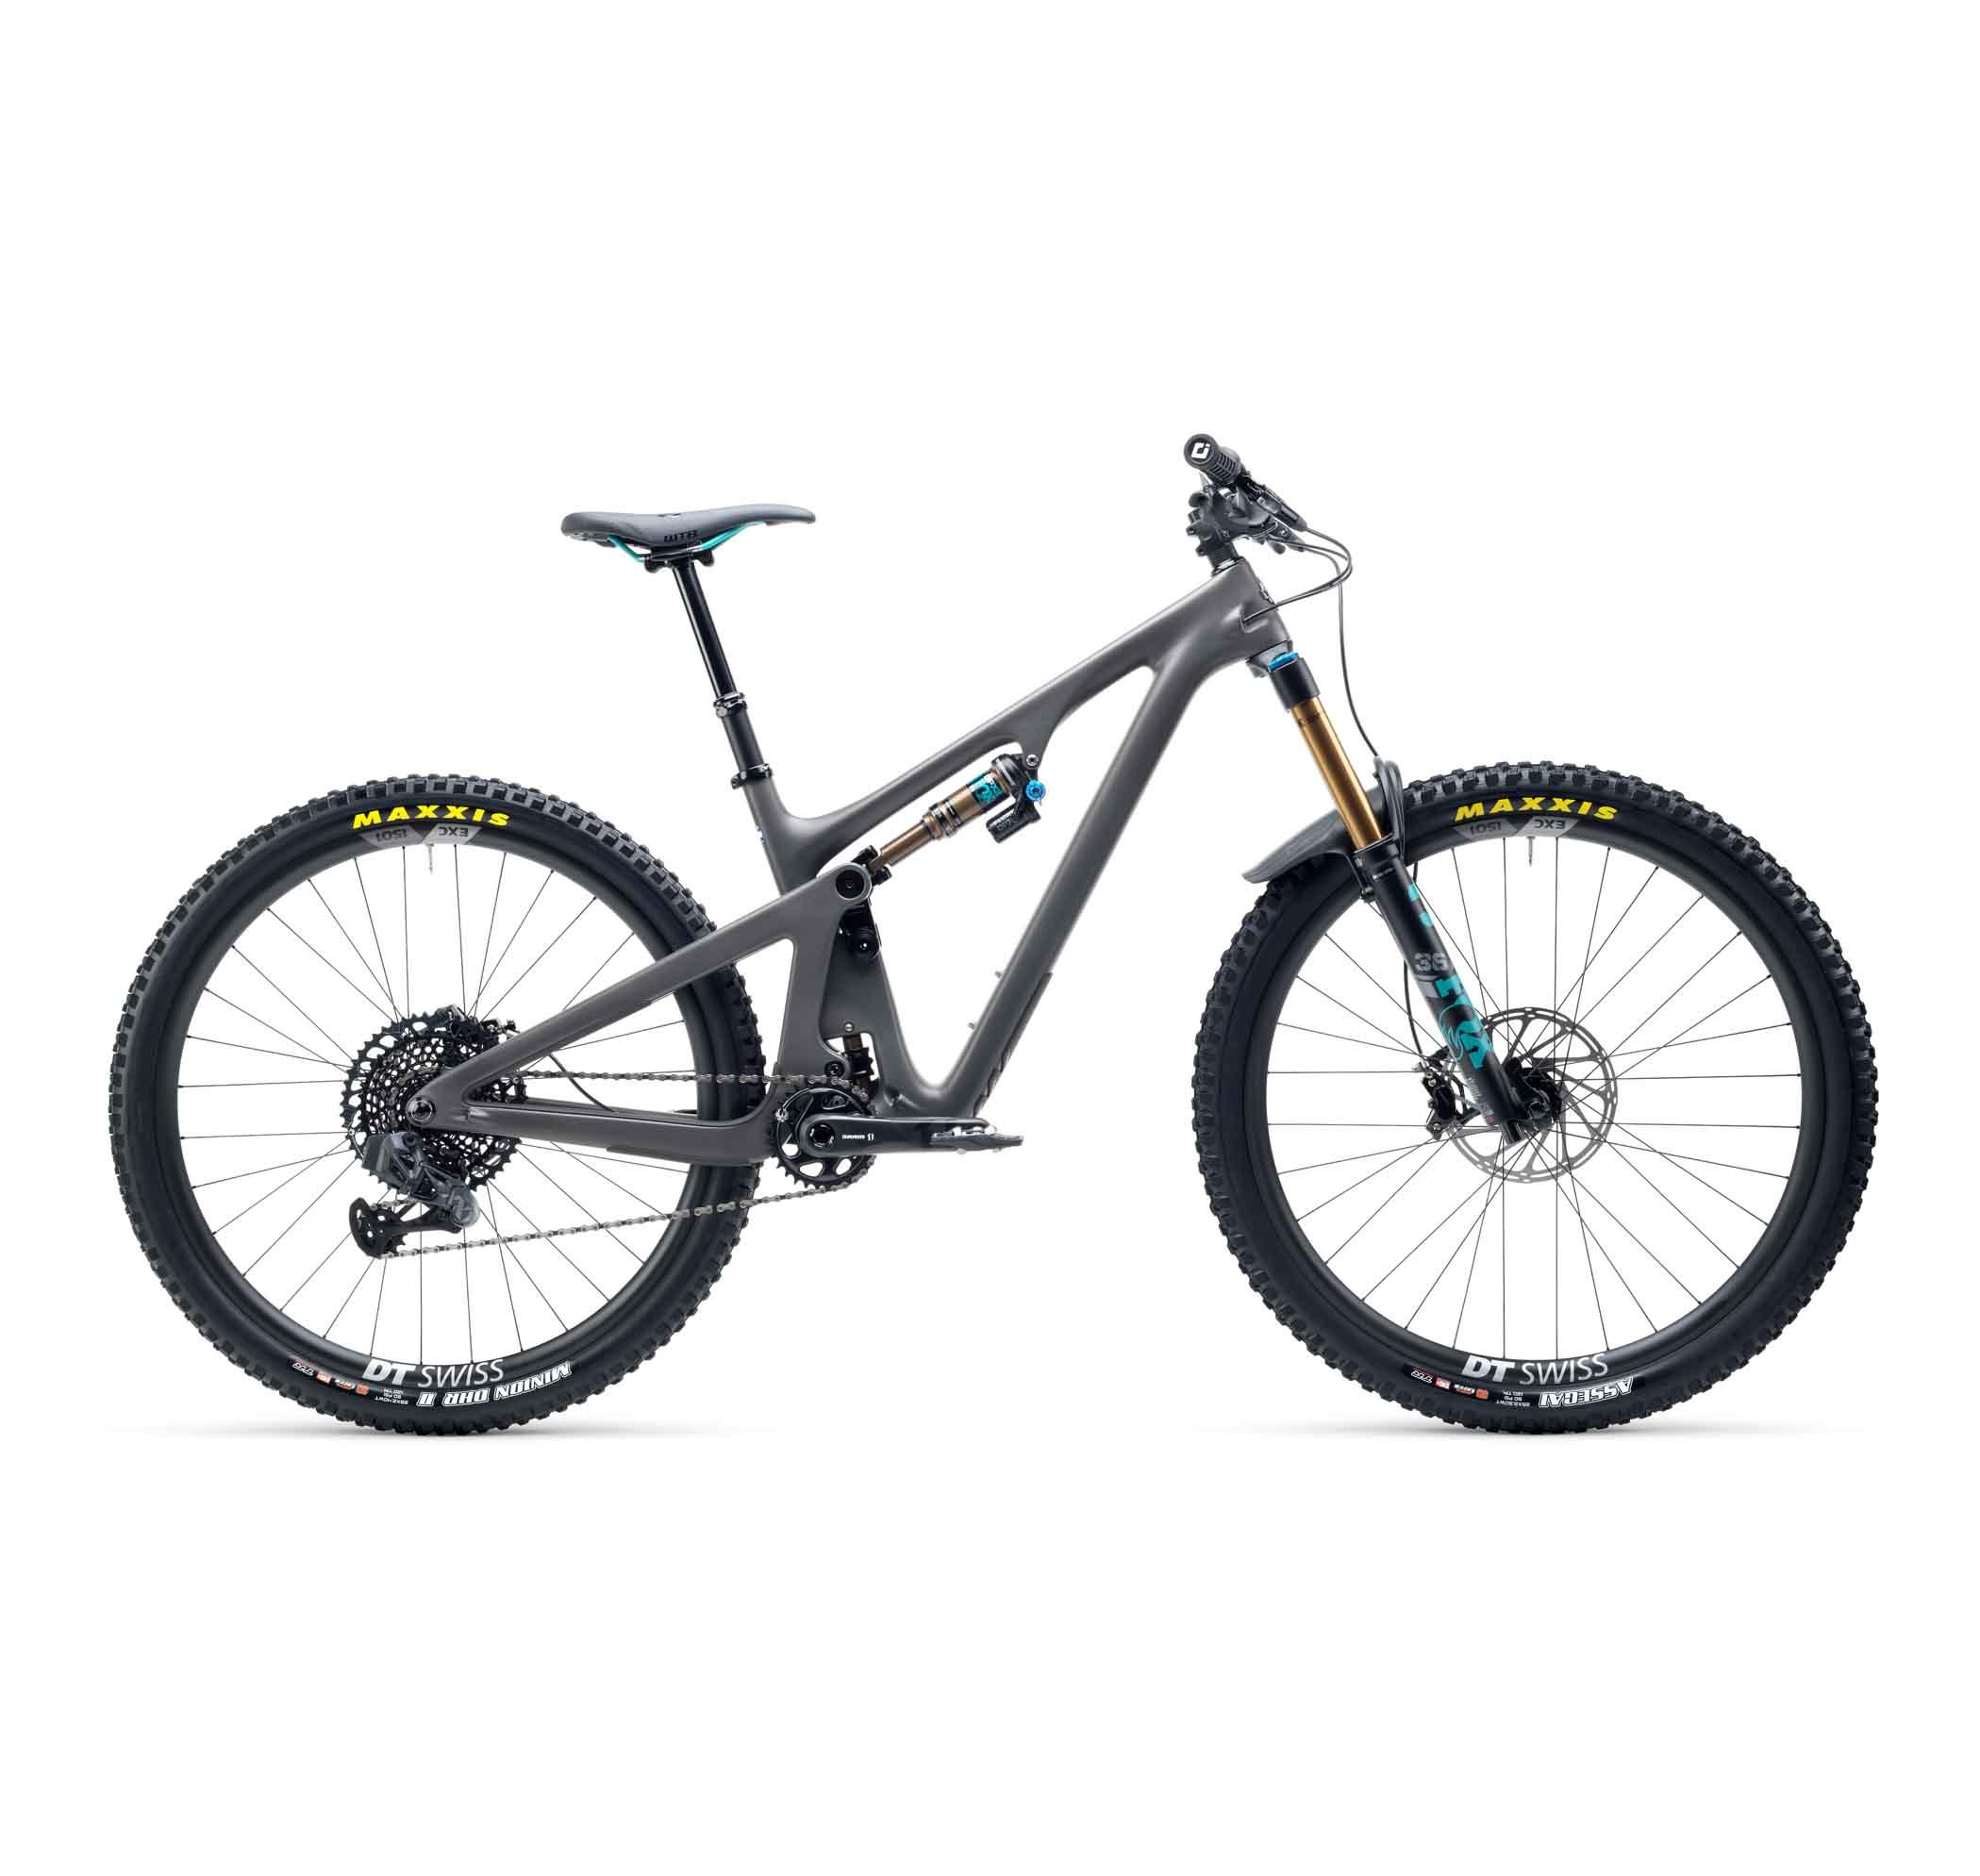 Yeti_Cycles_Rodeo_Bike_SB130_LR_Anthracite